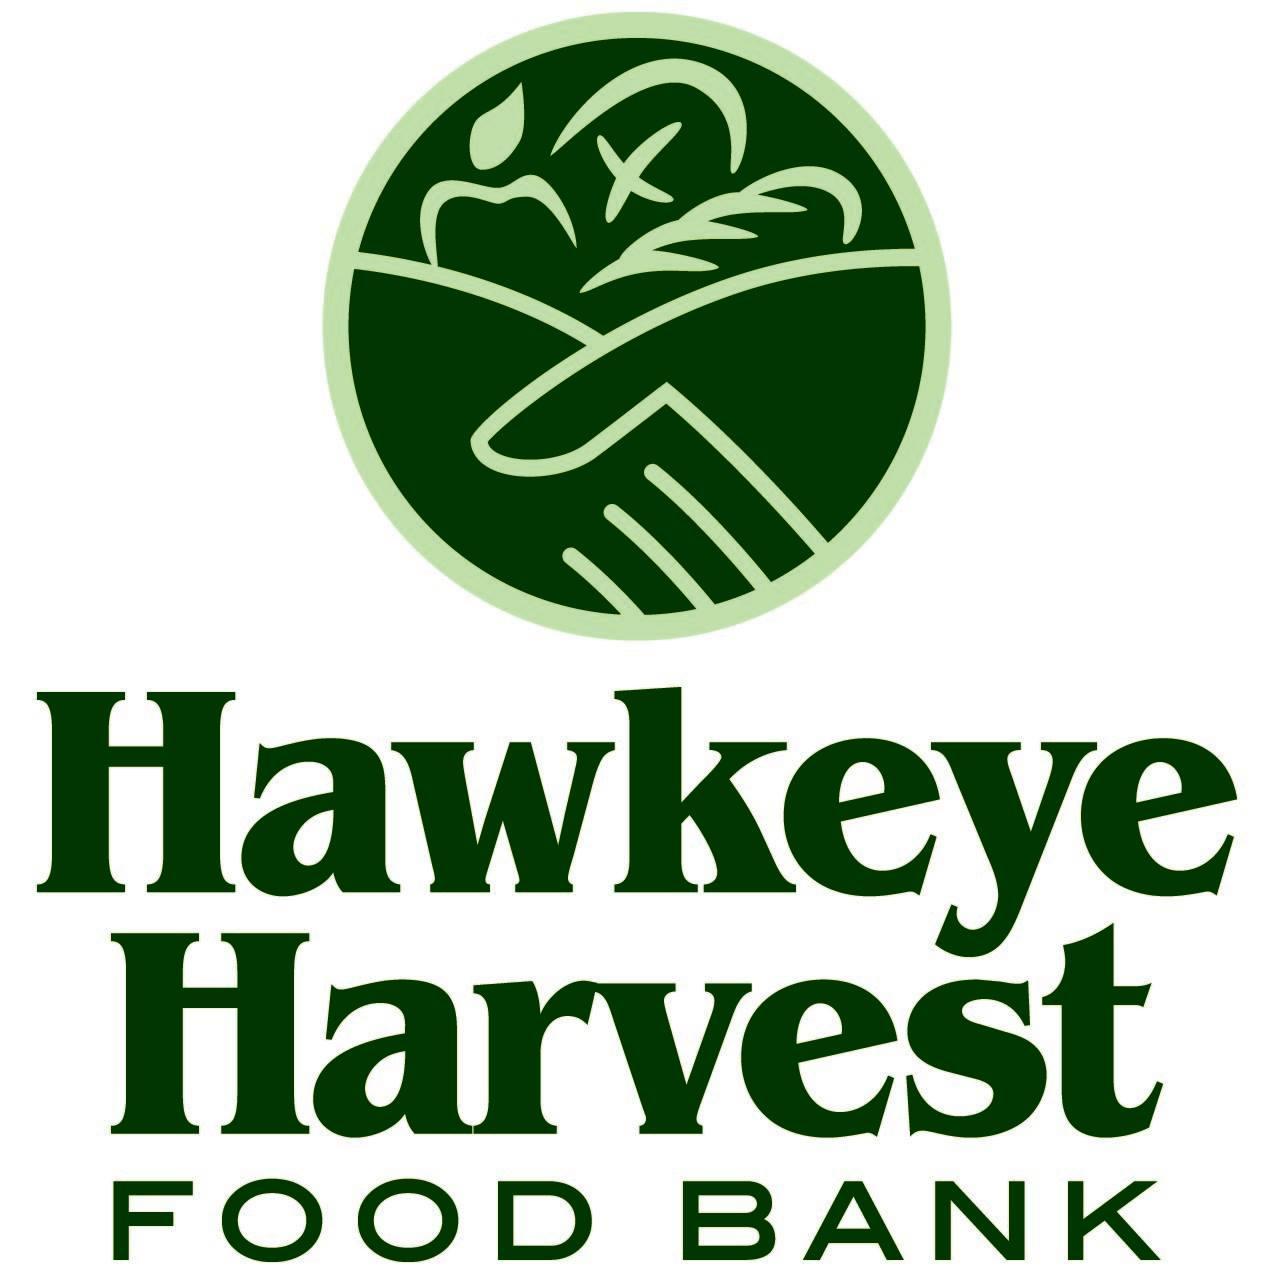 Hawkeye Harvest Food Bank